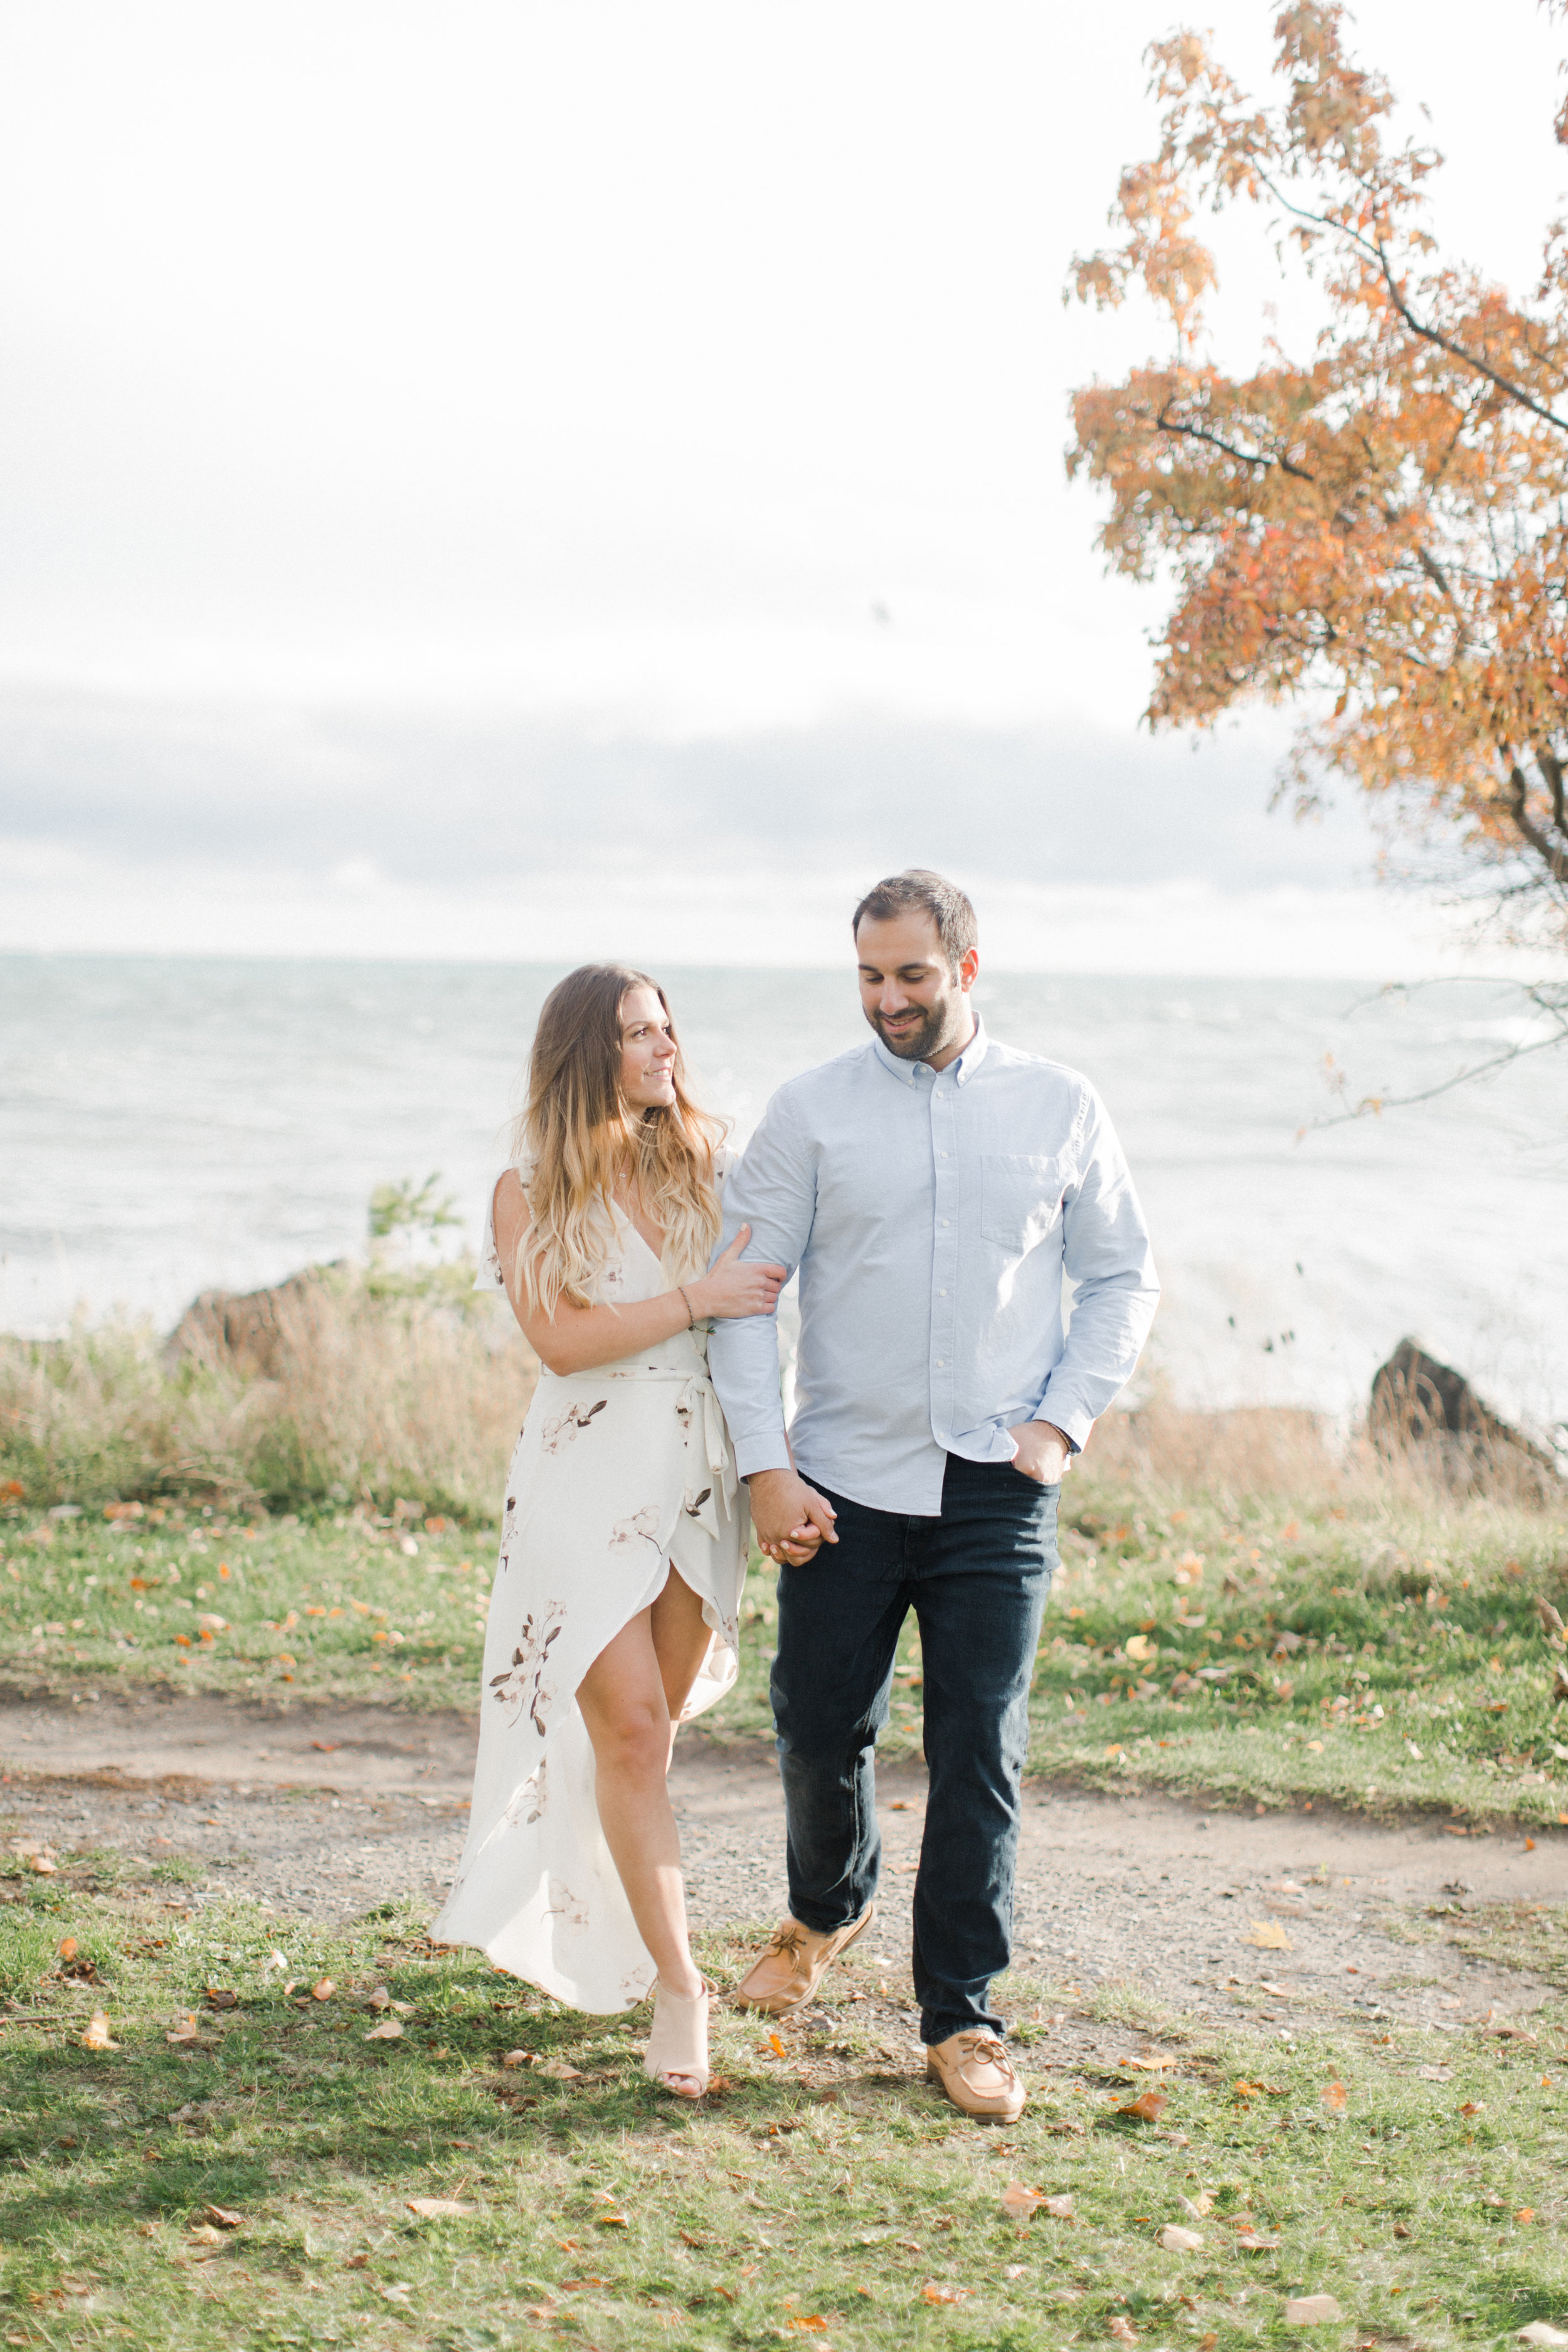 ashbridges-bay-toronto-wedding-photographer-soft-bright-pretty-pastel-richelle-hunter-lauren-miller-heather-chris-previews-3-2.jpg